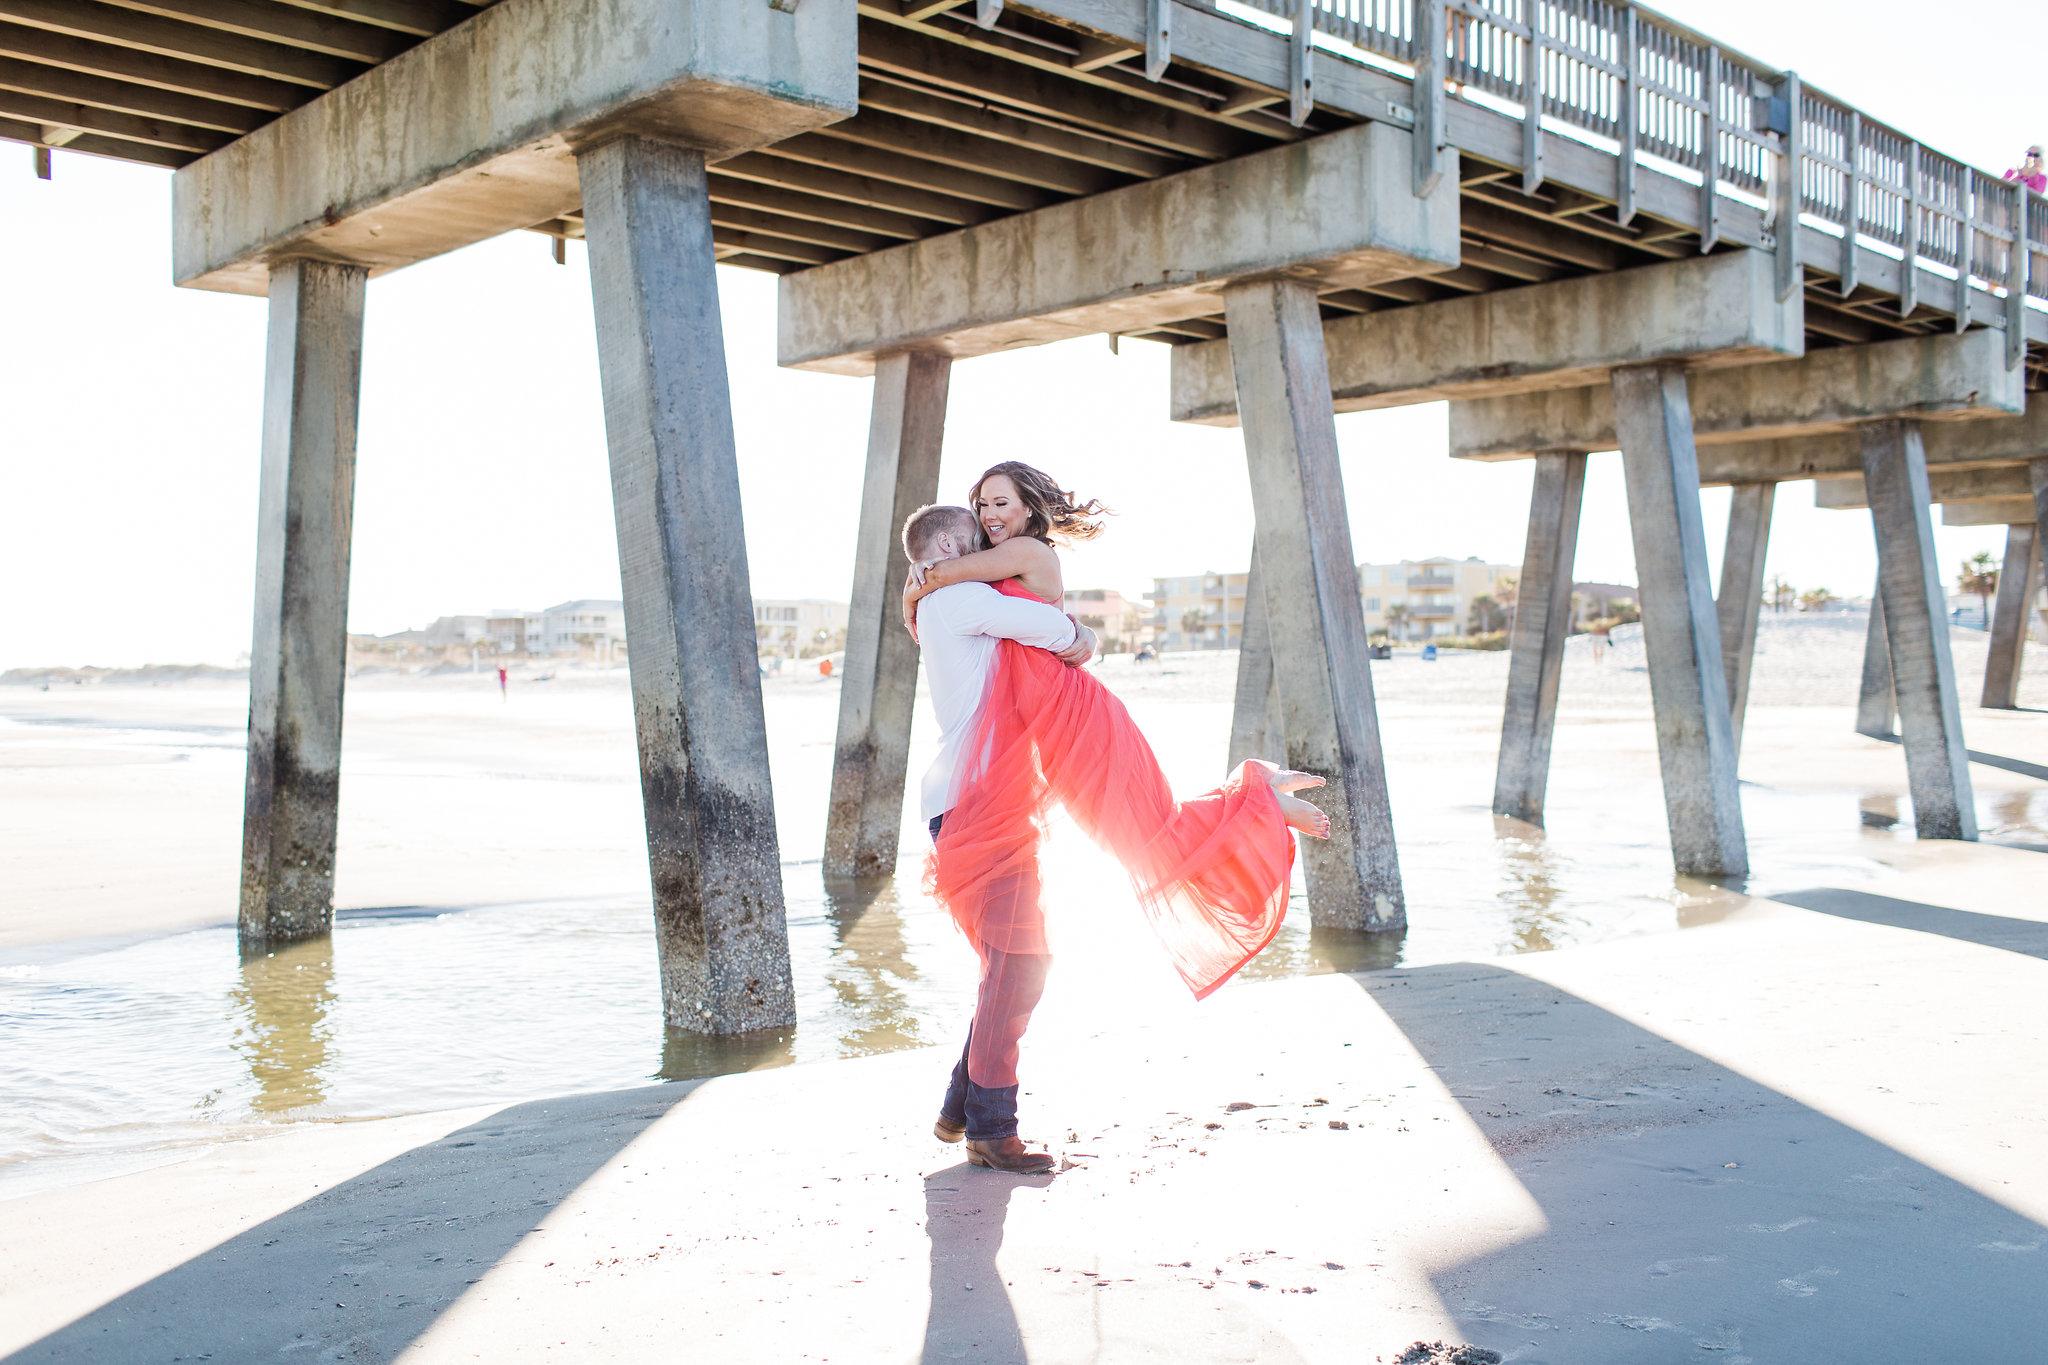 Erin-kevin-apt-b-photography-tybee-island-engagement-photoshoot-savannah-engagement-savannah-wedding-savannah-wedding-photographer-tybee-island-wedding-beach-engagement-01.jpg